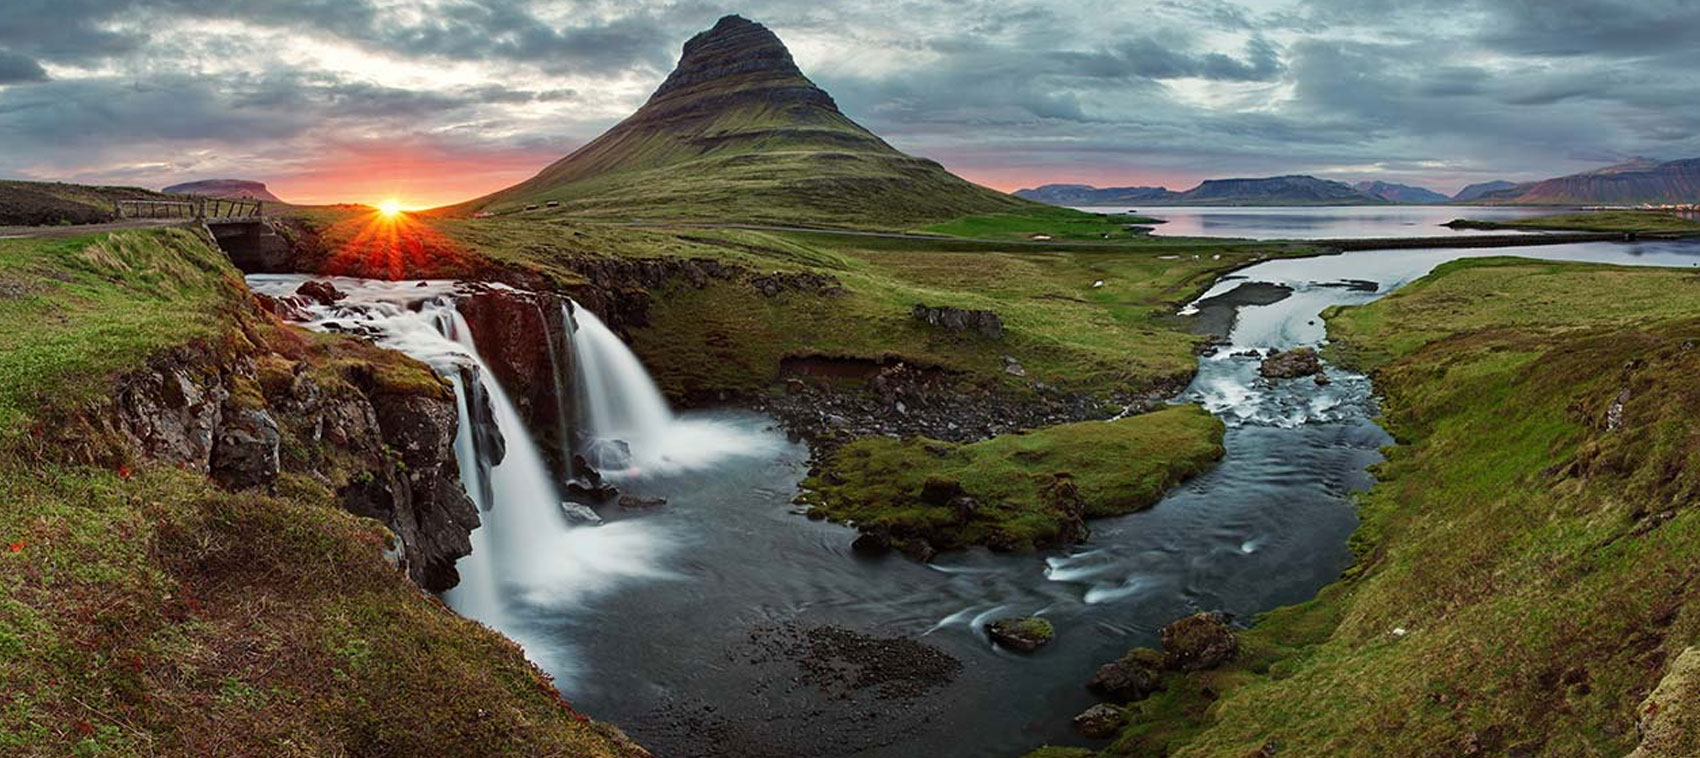 Iceland Trek July 2018 Challenge